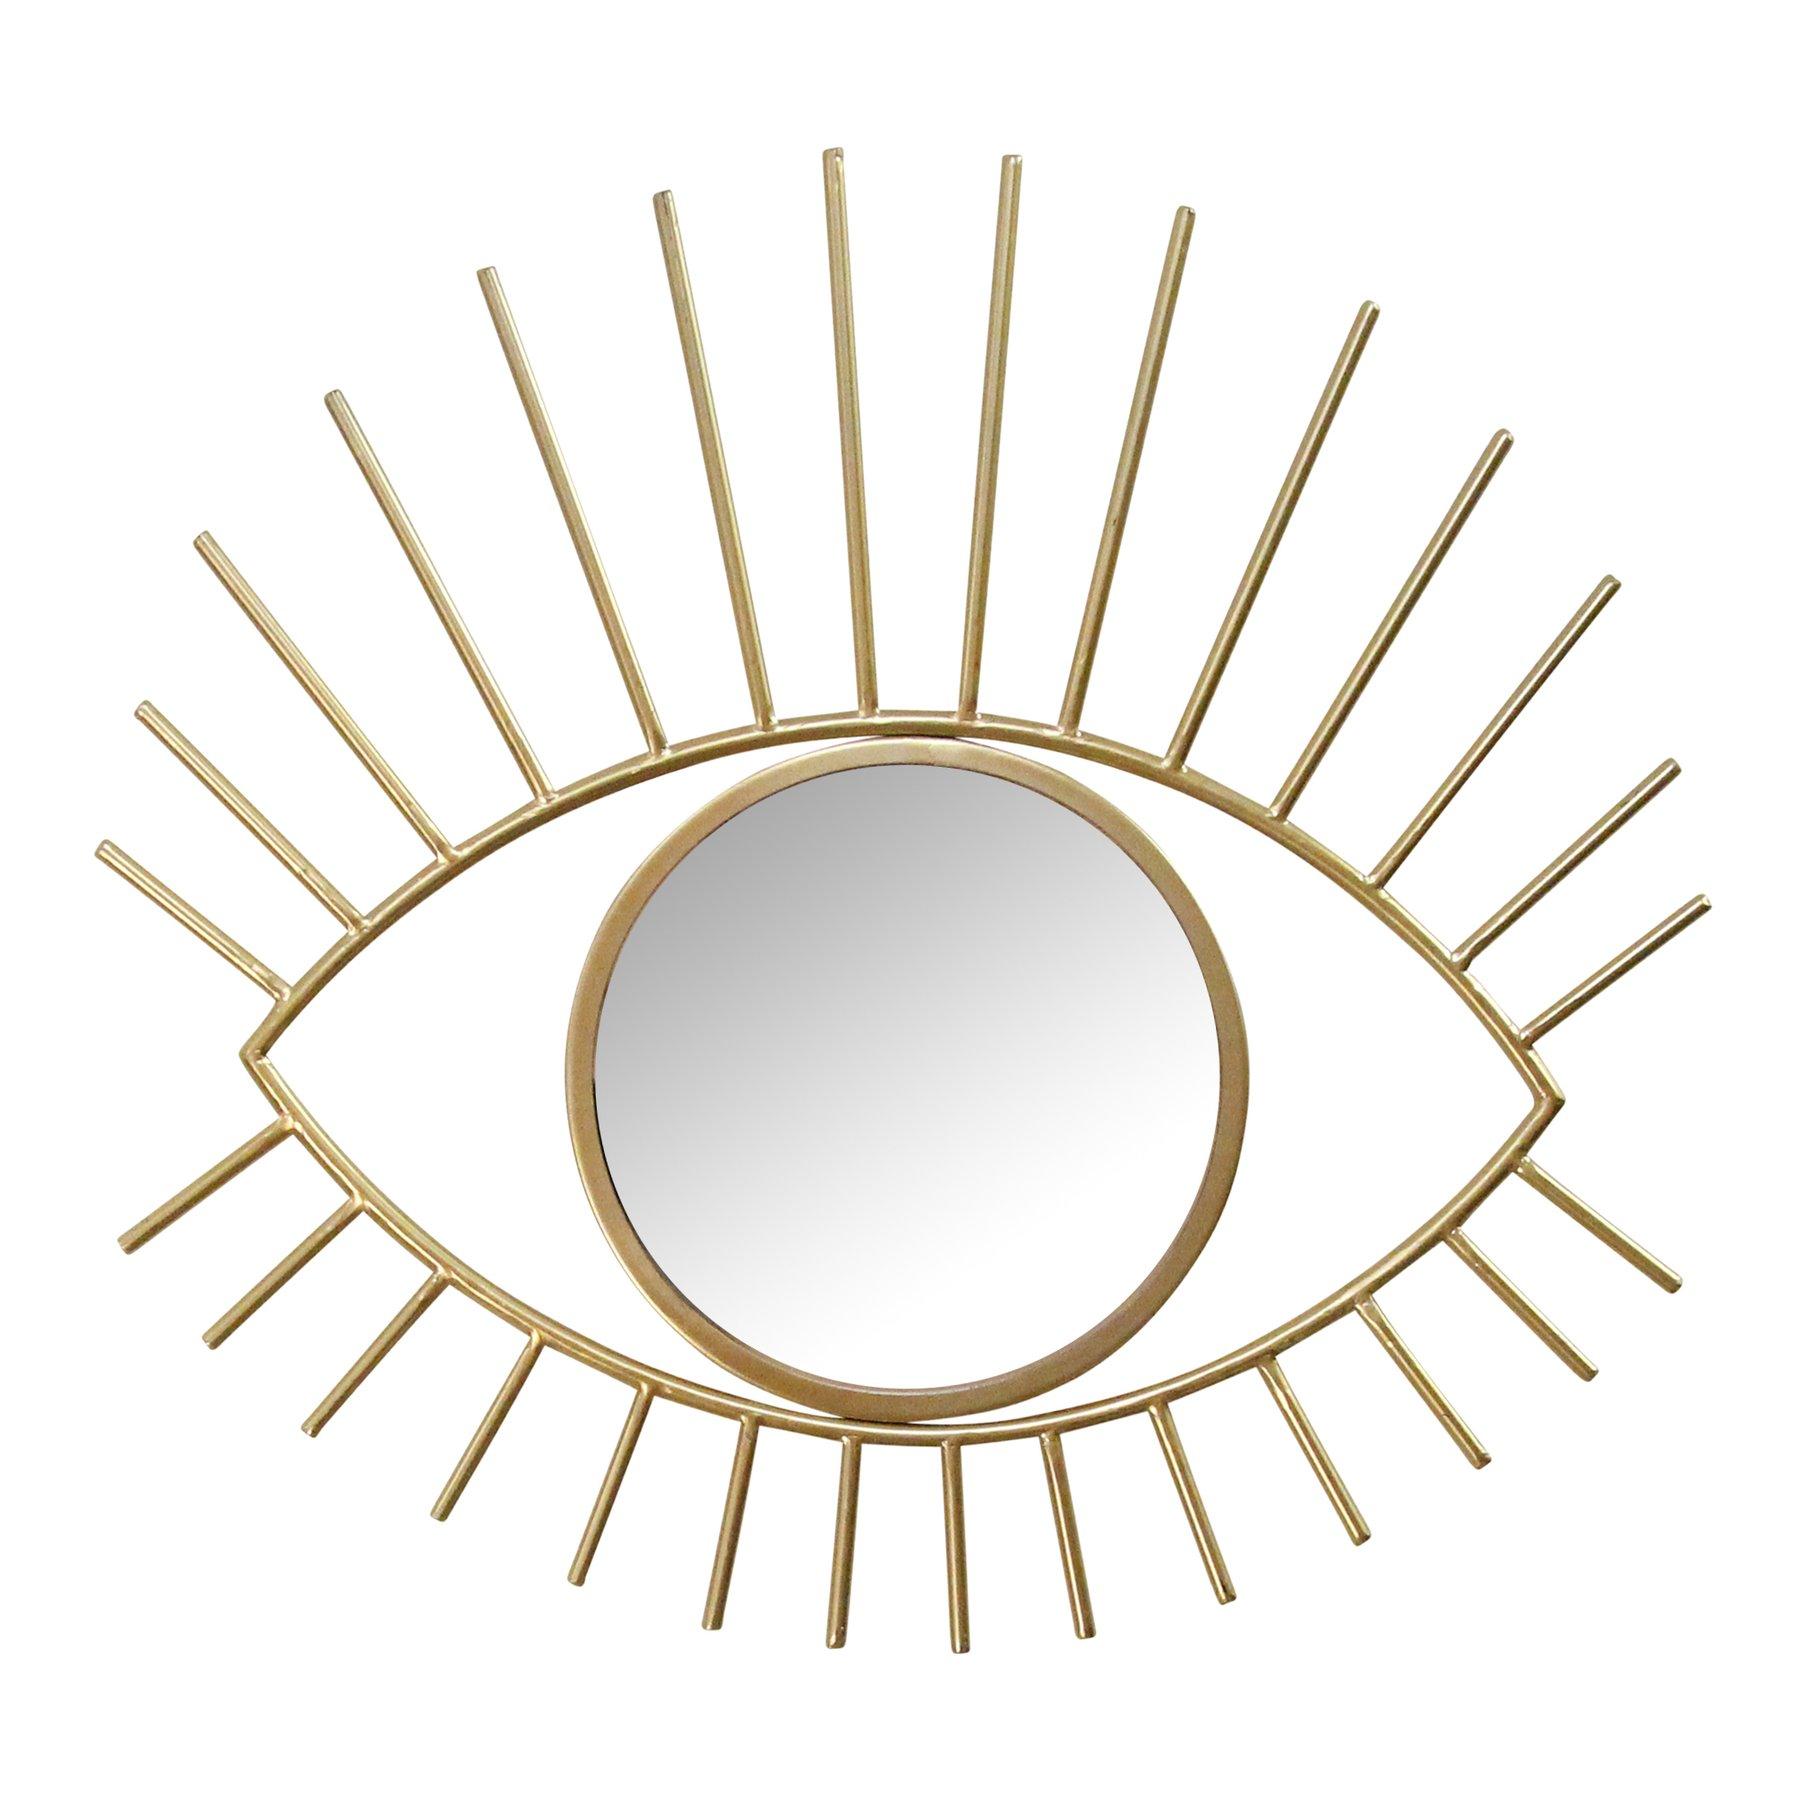 stratton-home-eyeball-eyelash-kids-room-wall-mirror-whimsical-fun.jpg